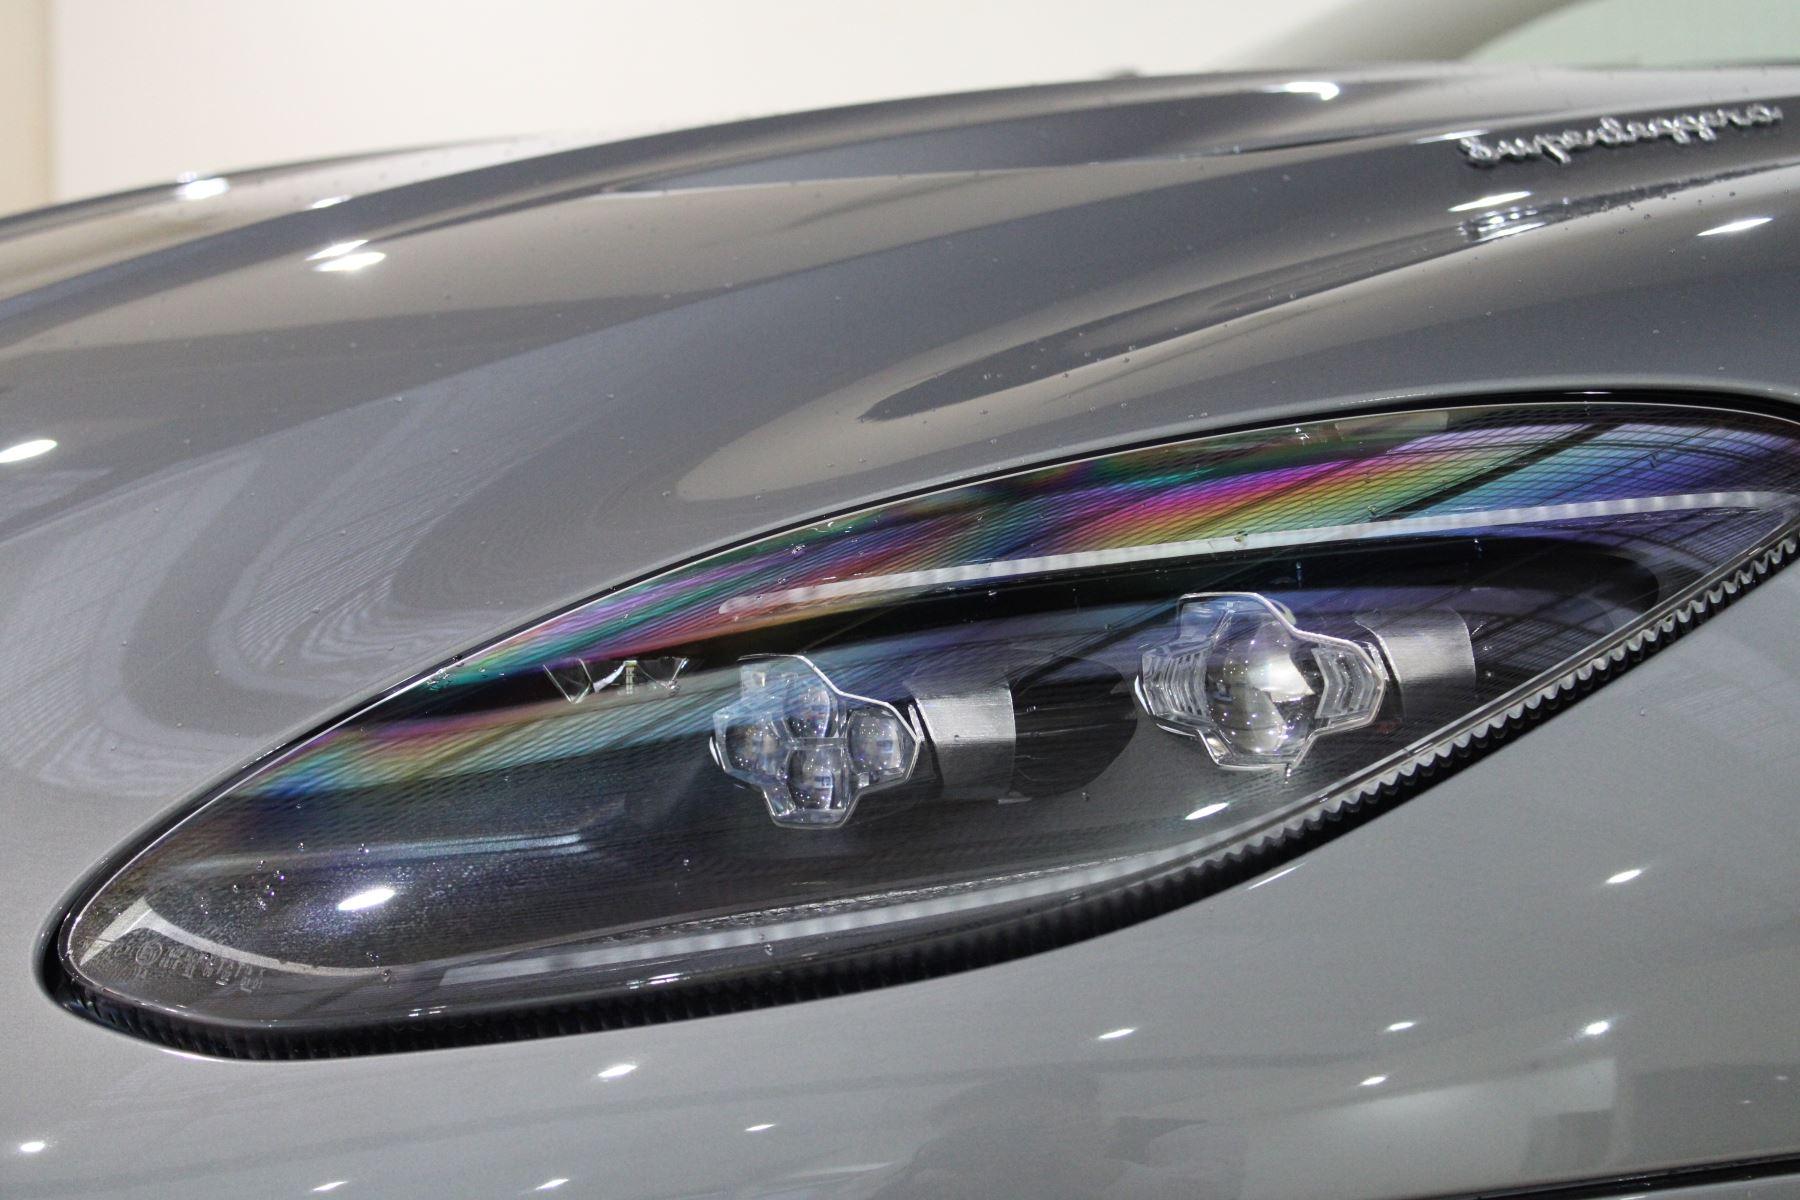 Aston Martin DBS V12 Superleggera 2dr Touchtronic image 11